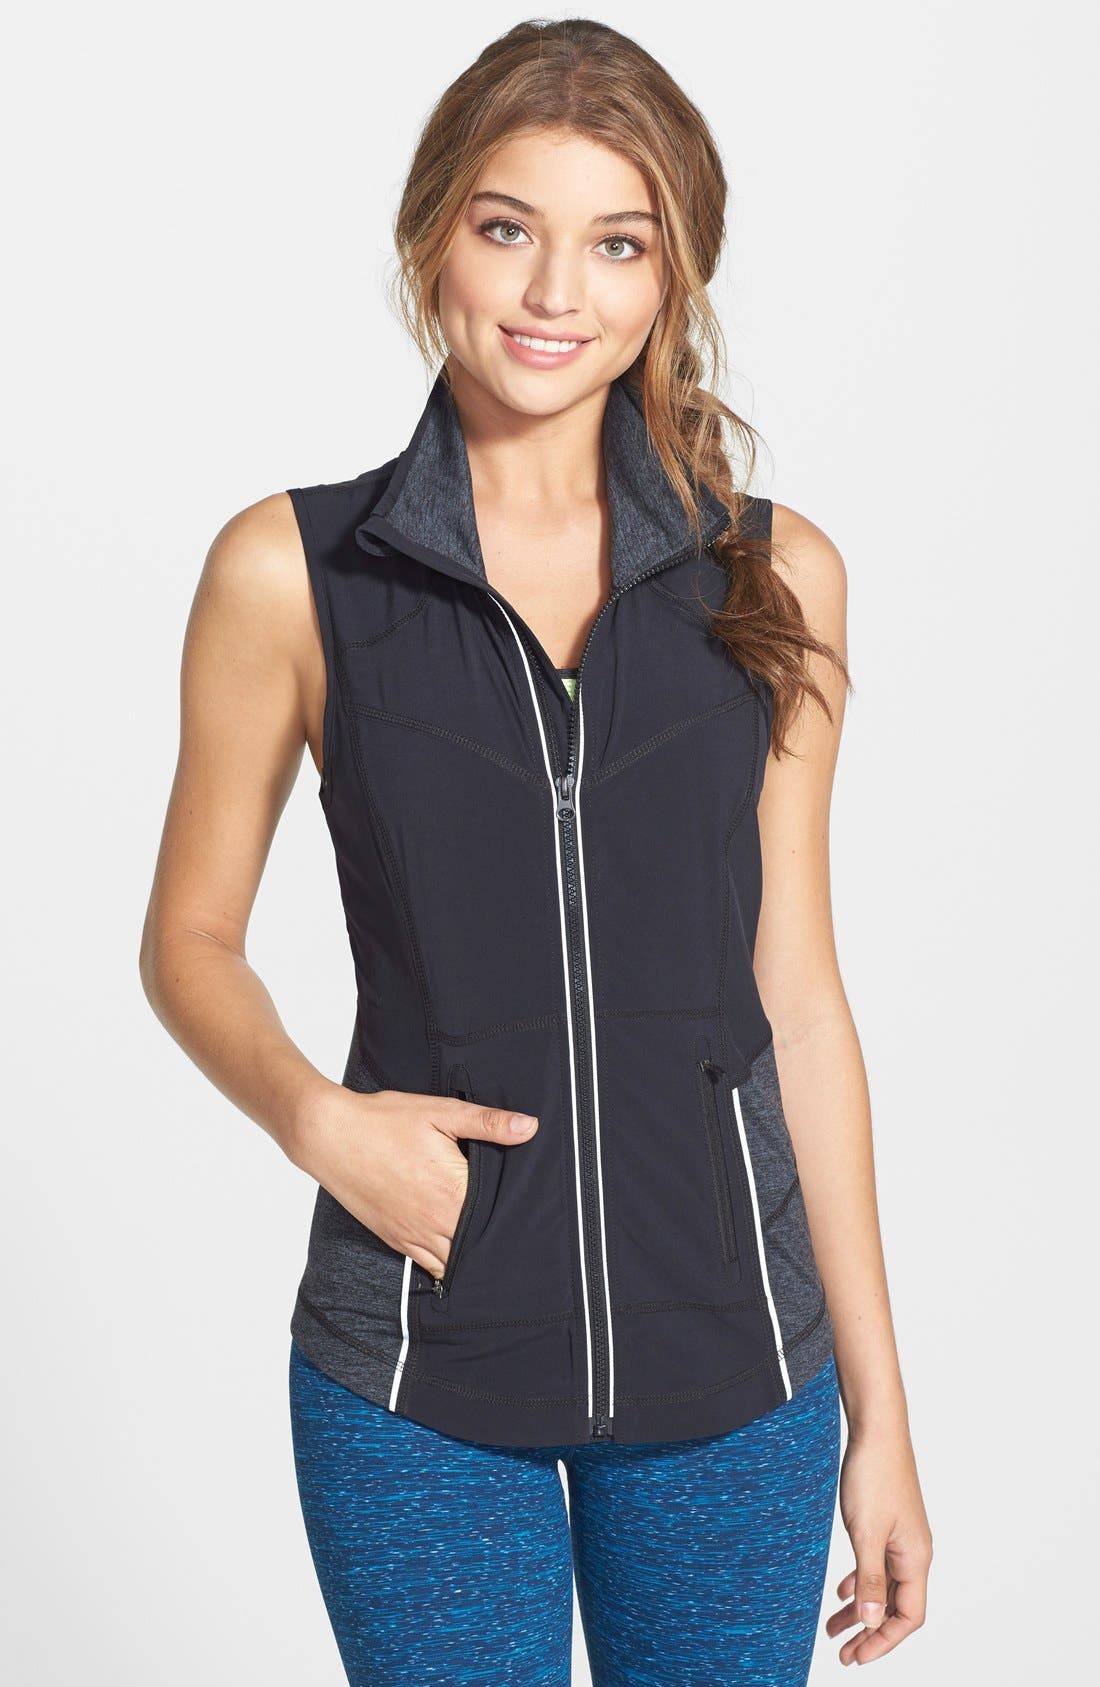 Alternate Image 1 Selected - Zella 'Momentum' Vest